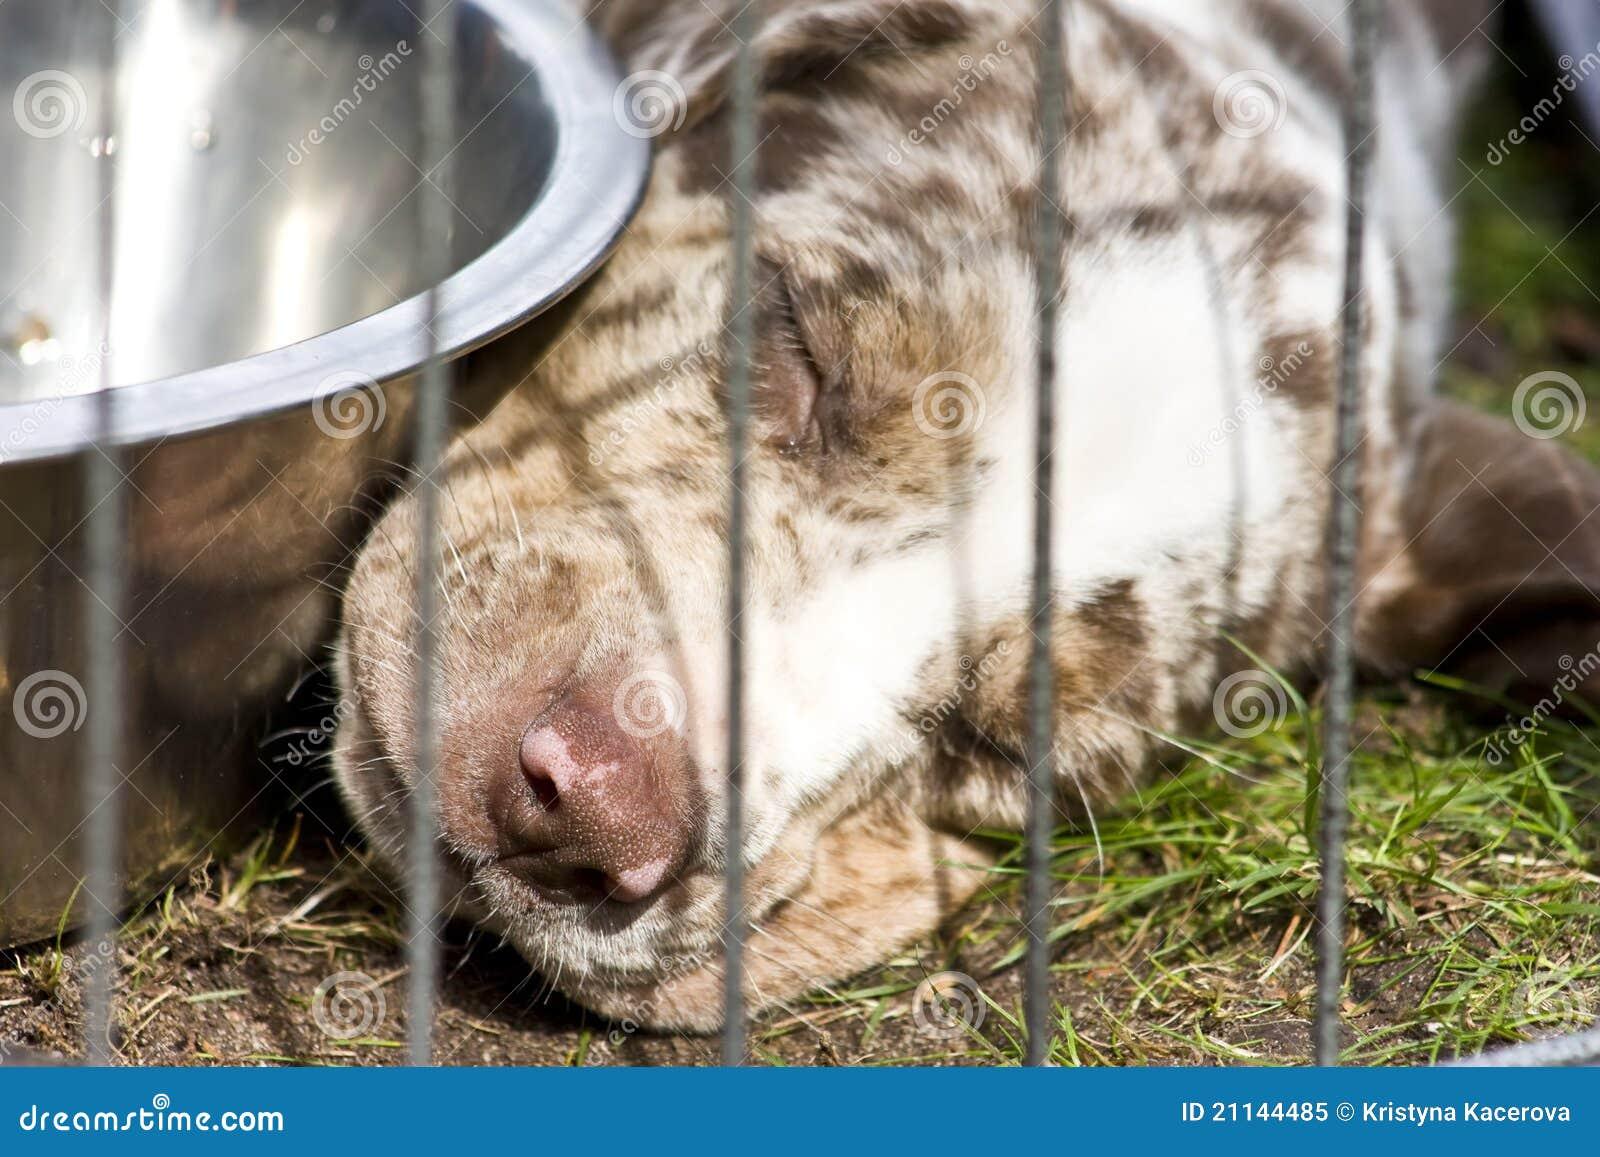 Catahoula Puppy Royalty Free Stock Photo - Image: 21144485